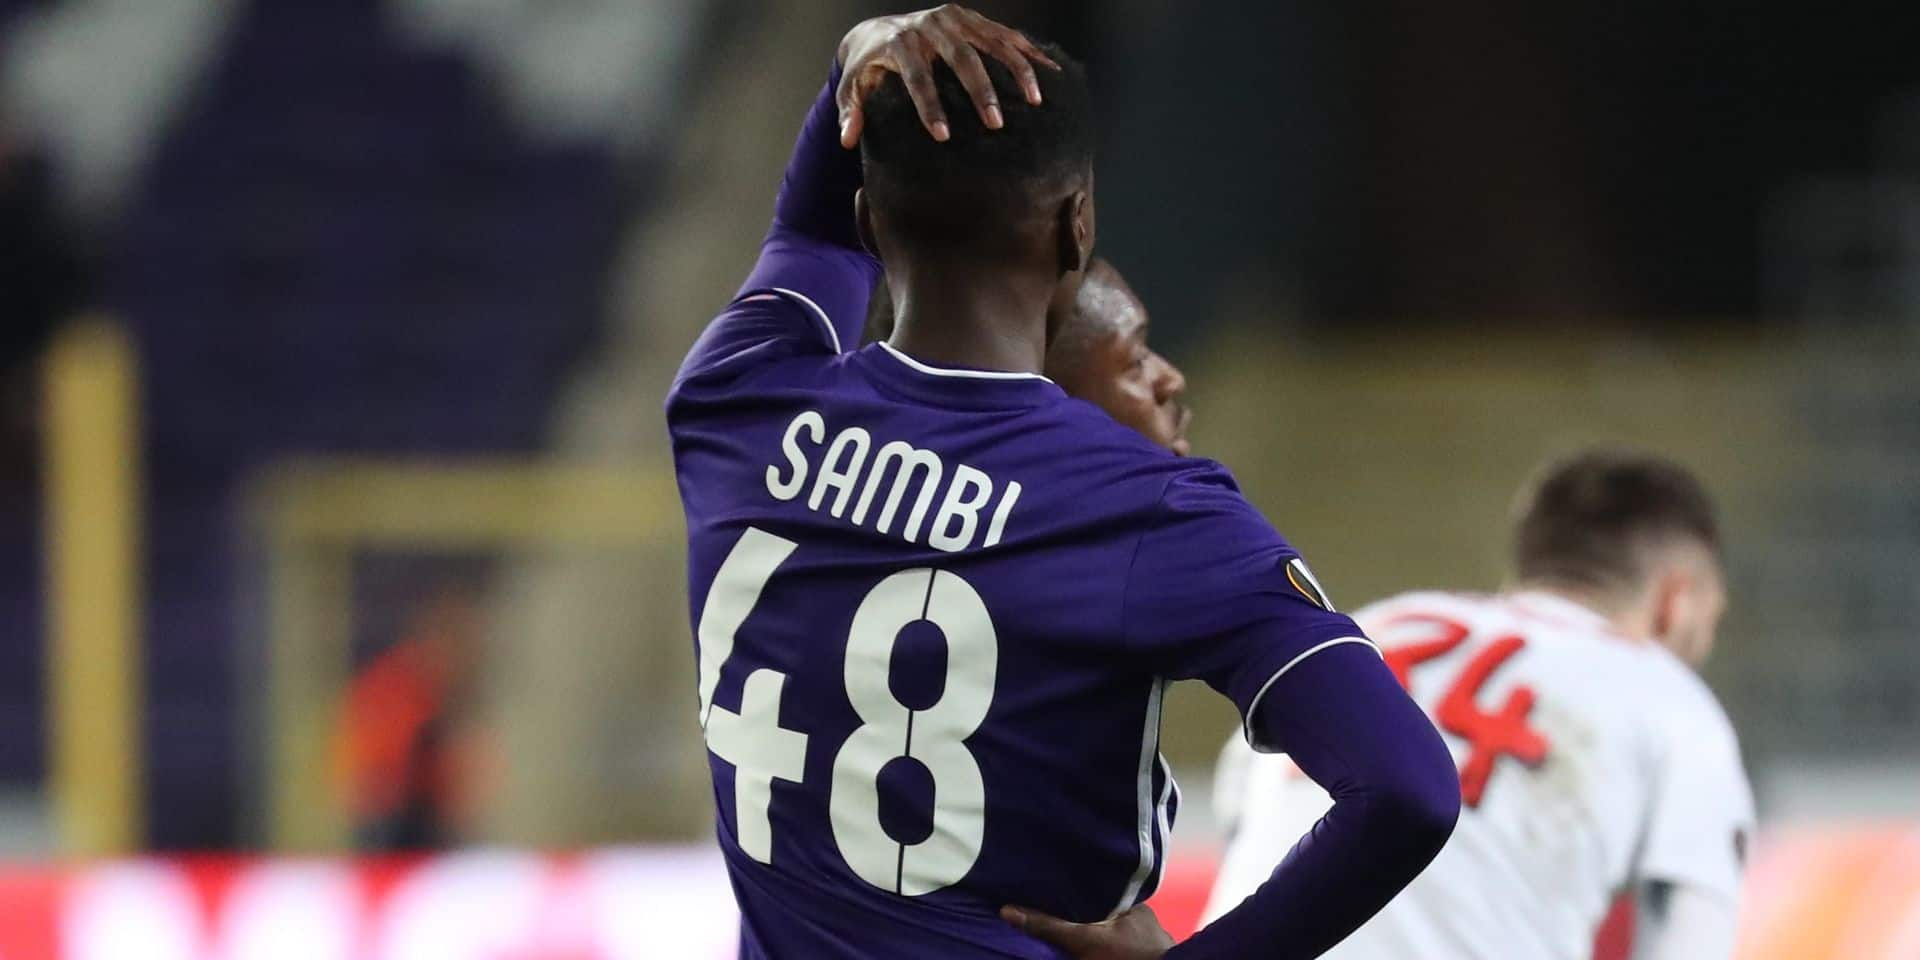 Anderlecht: Saison finie pour Sambi Lokonga